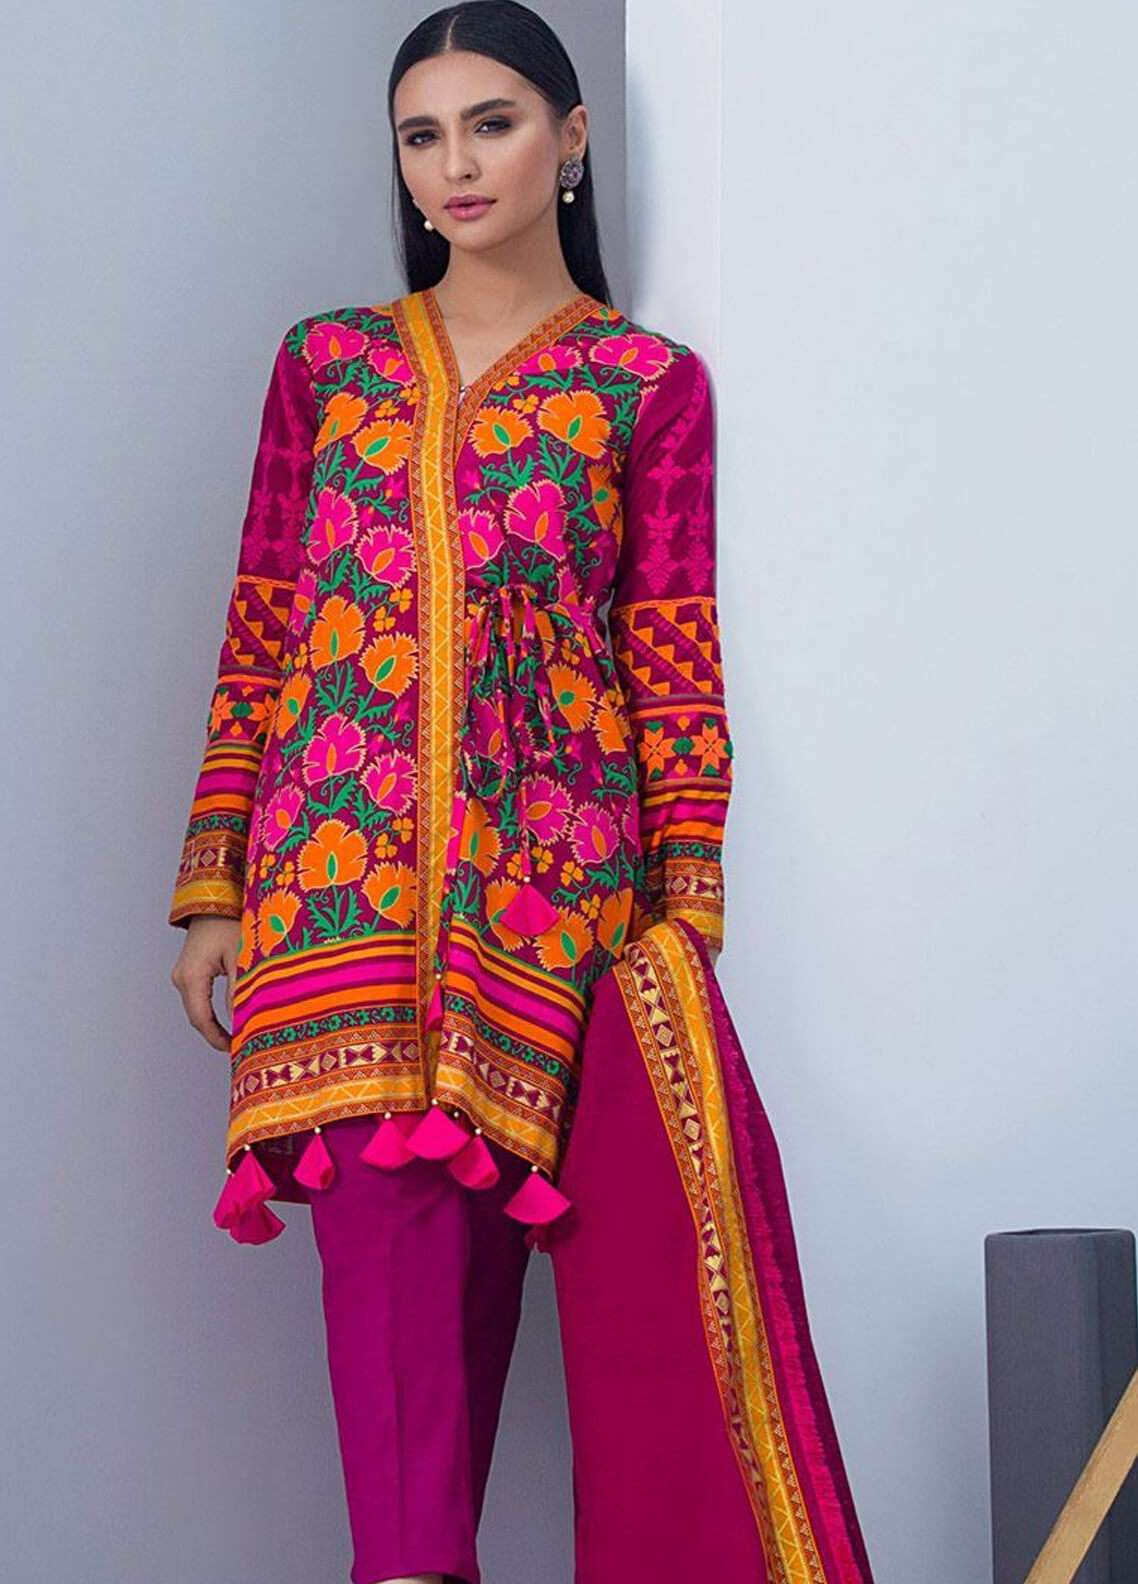 Orient Textile Embroidered Khaddar Unstitched 3 Piece Suit OT18W 219B Mesmerize - Winter Collection